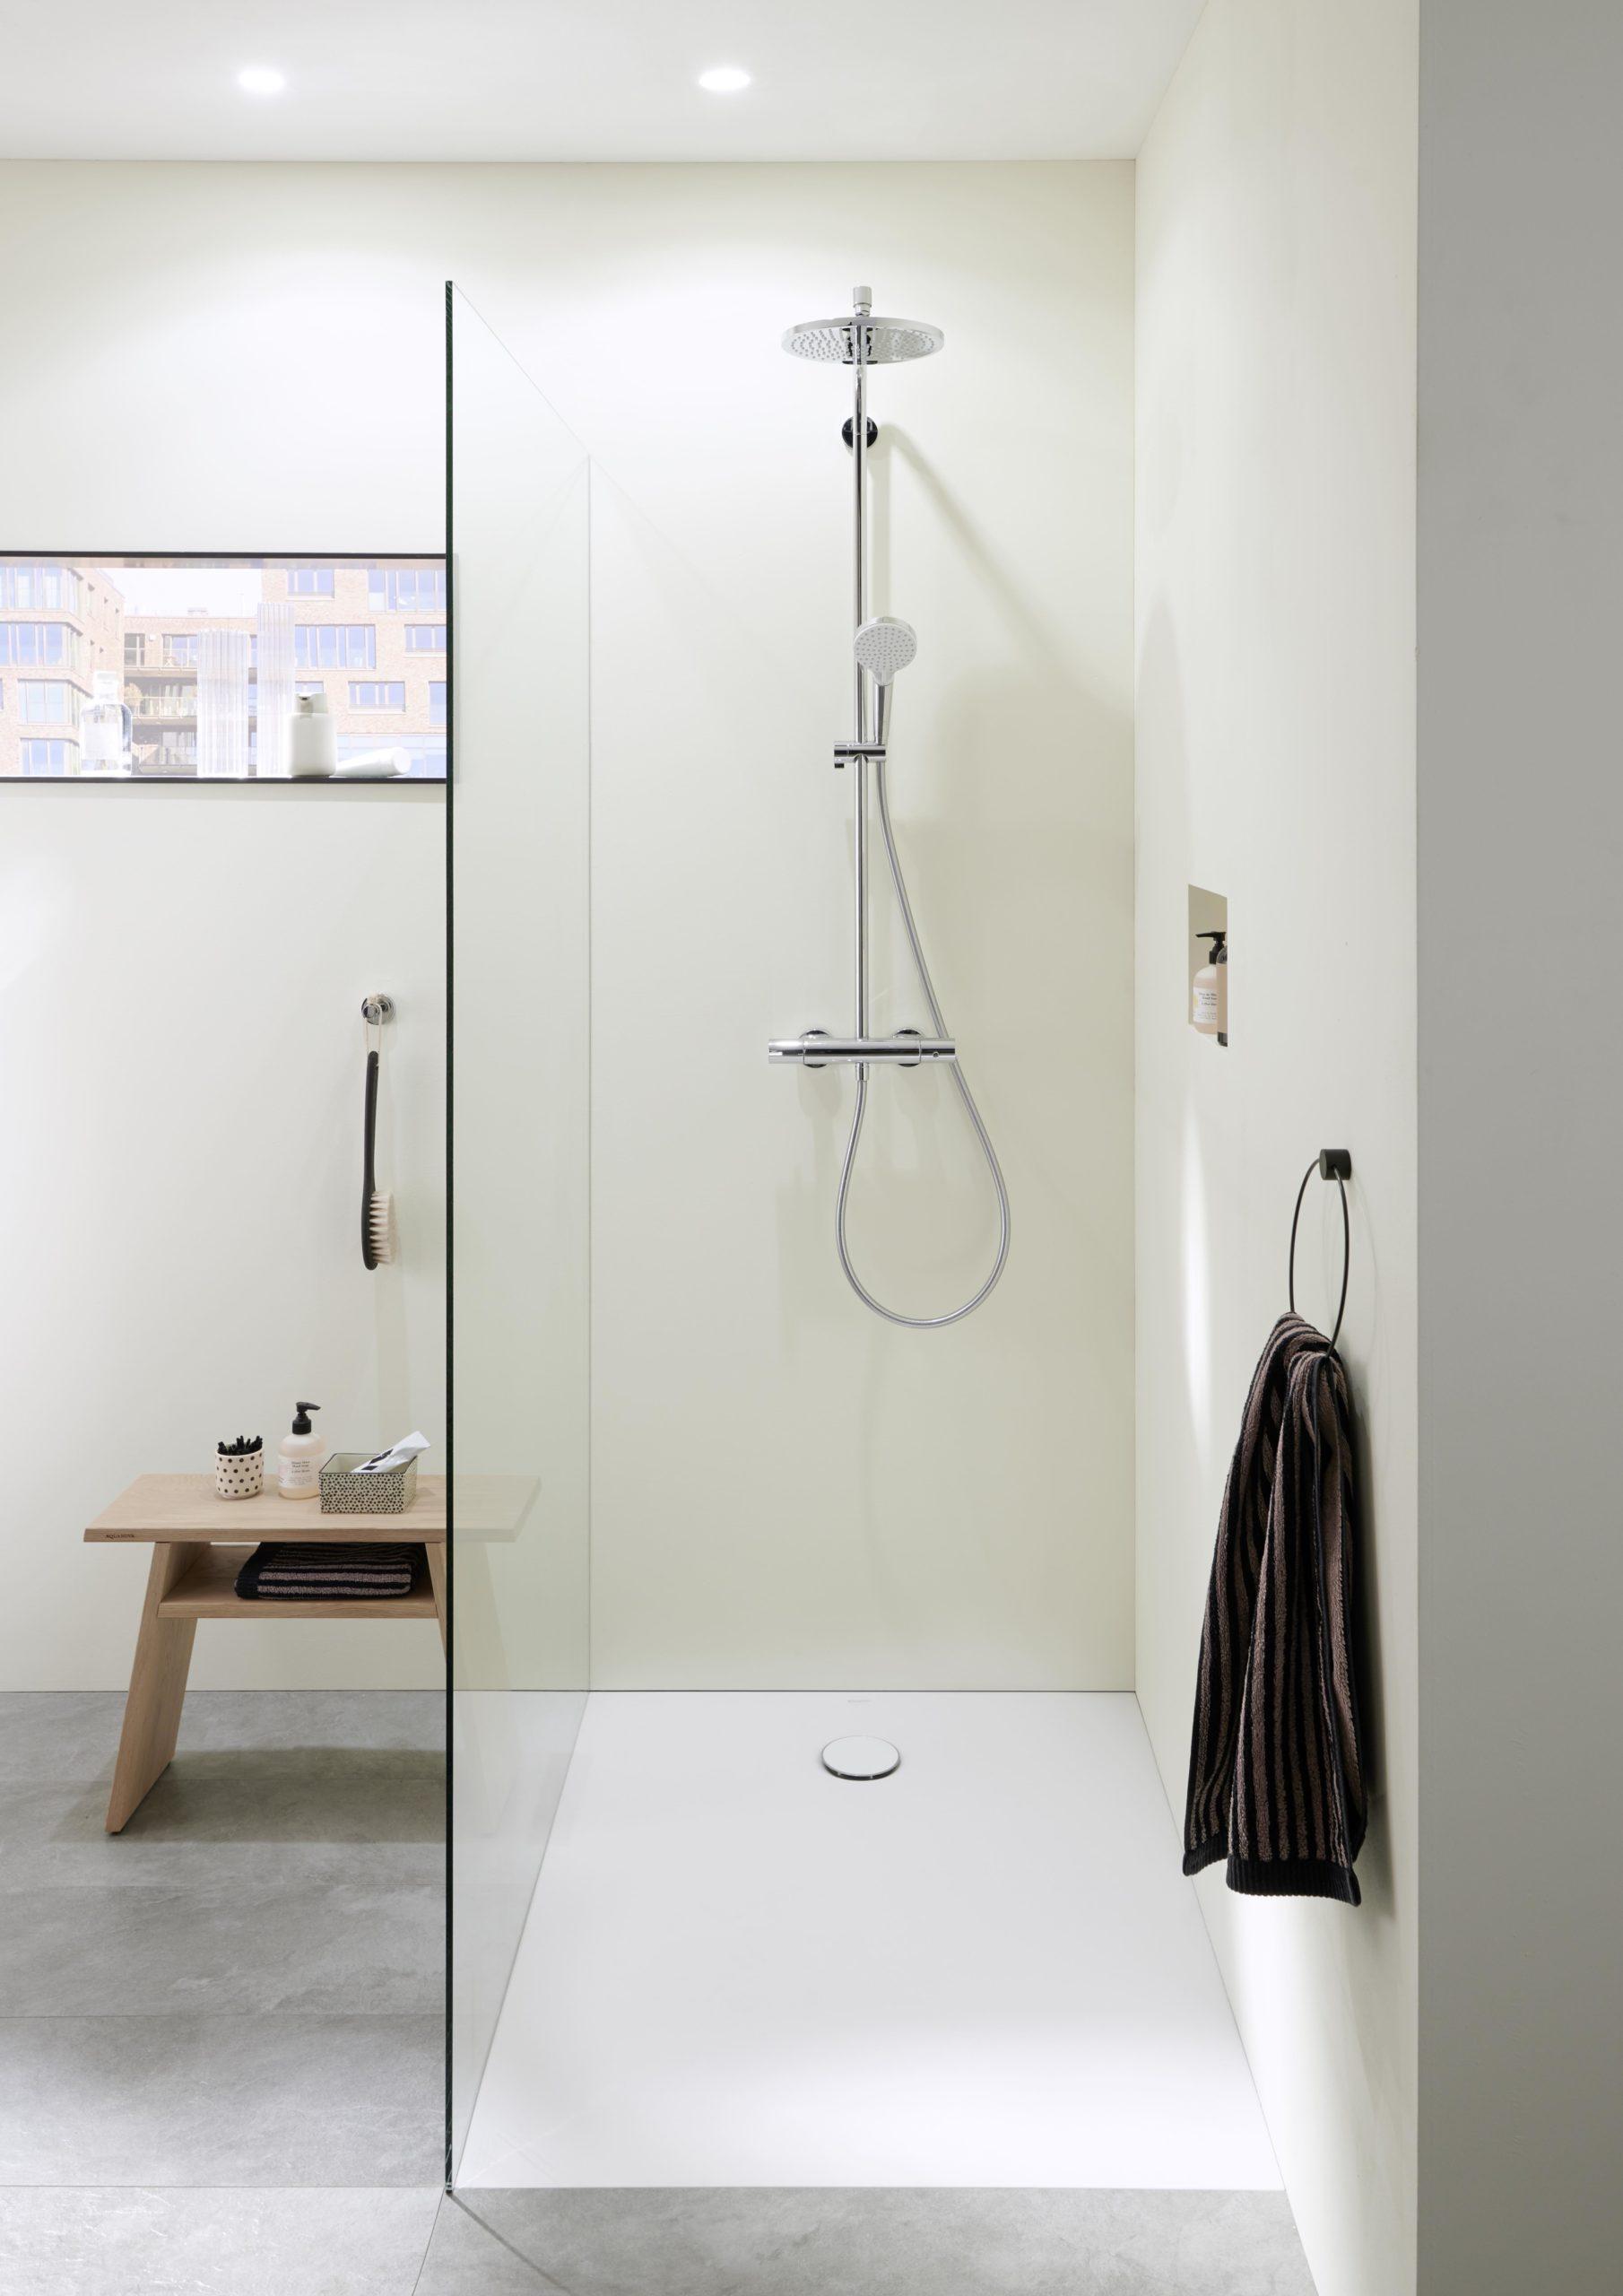 Sprchový kout bílý